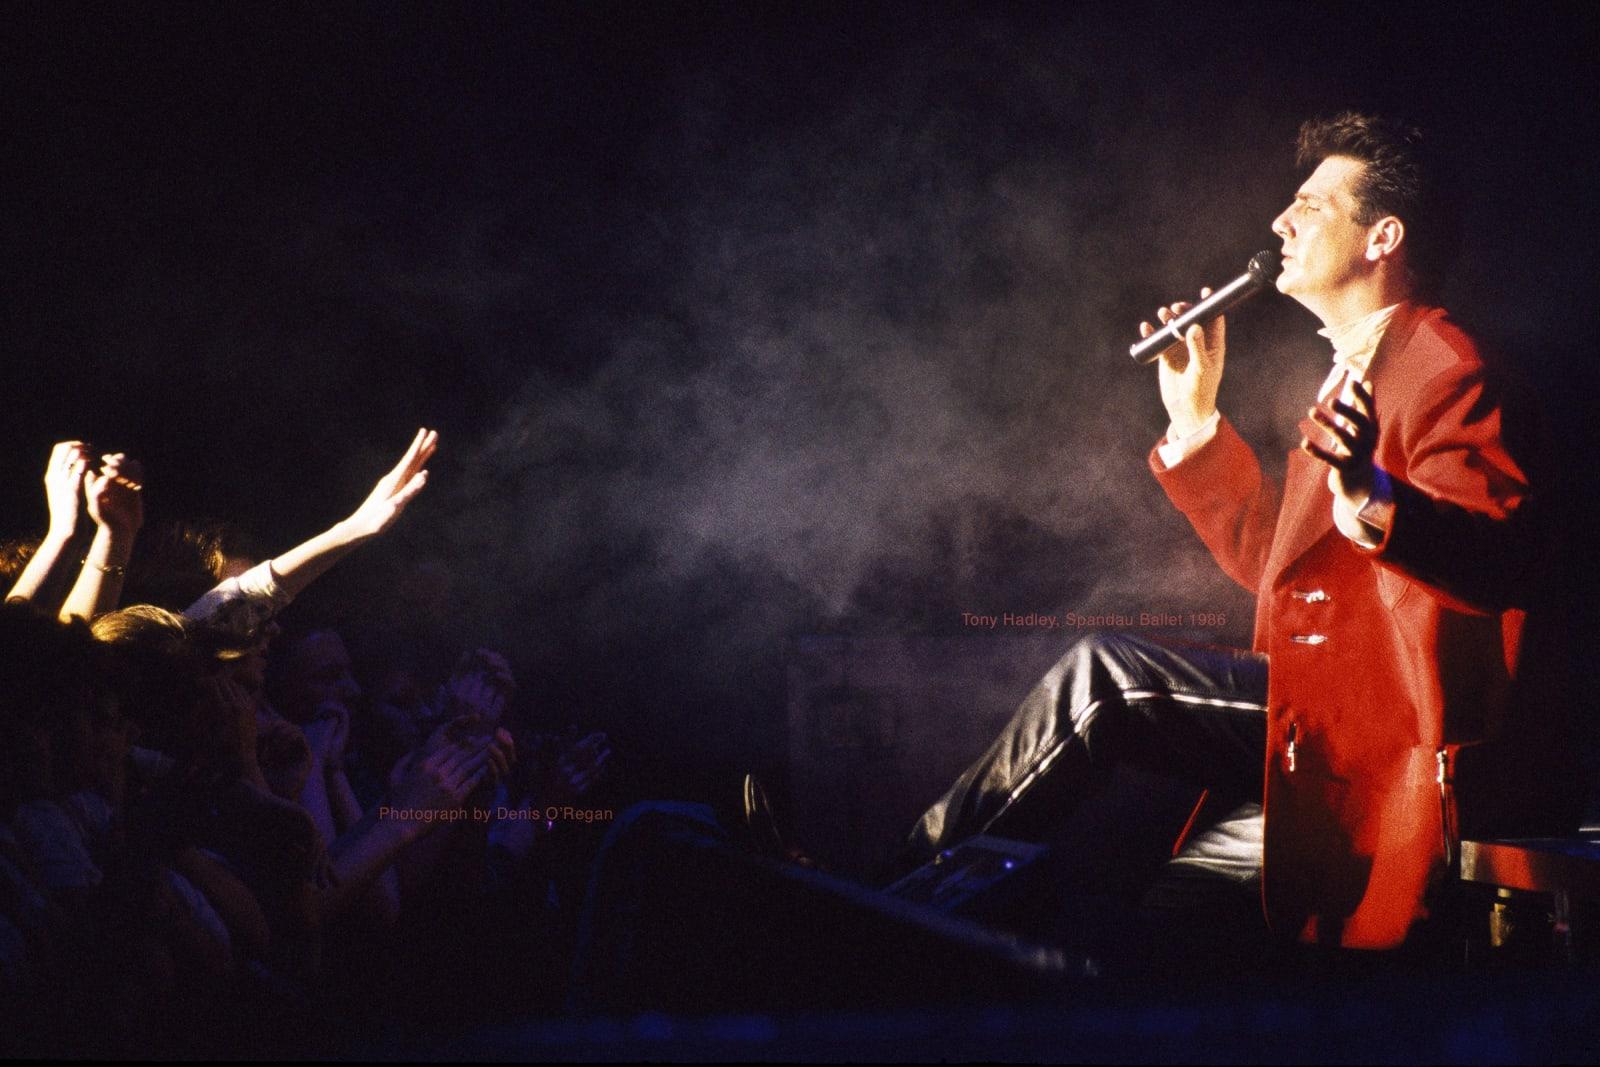 SPANDAU BALLET, Tony Hadley on stage, 1986